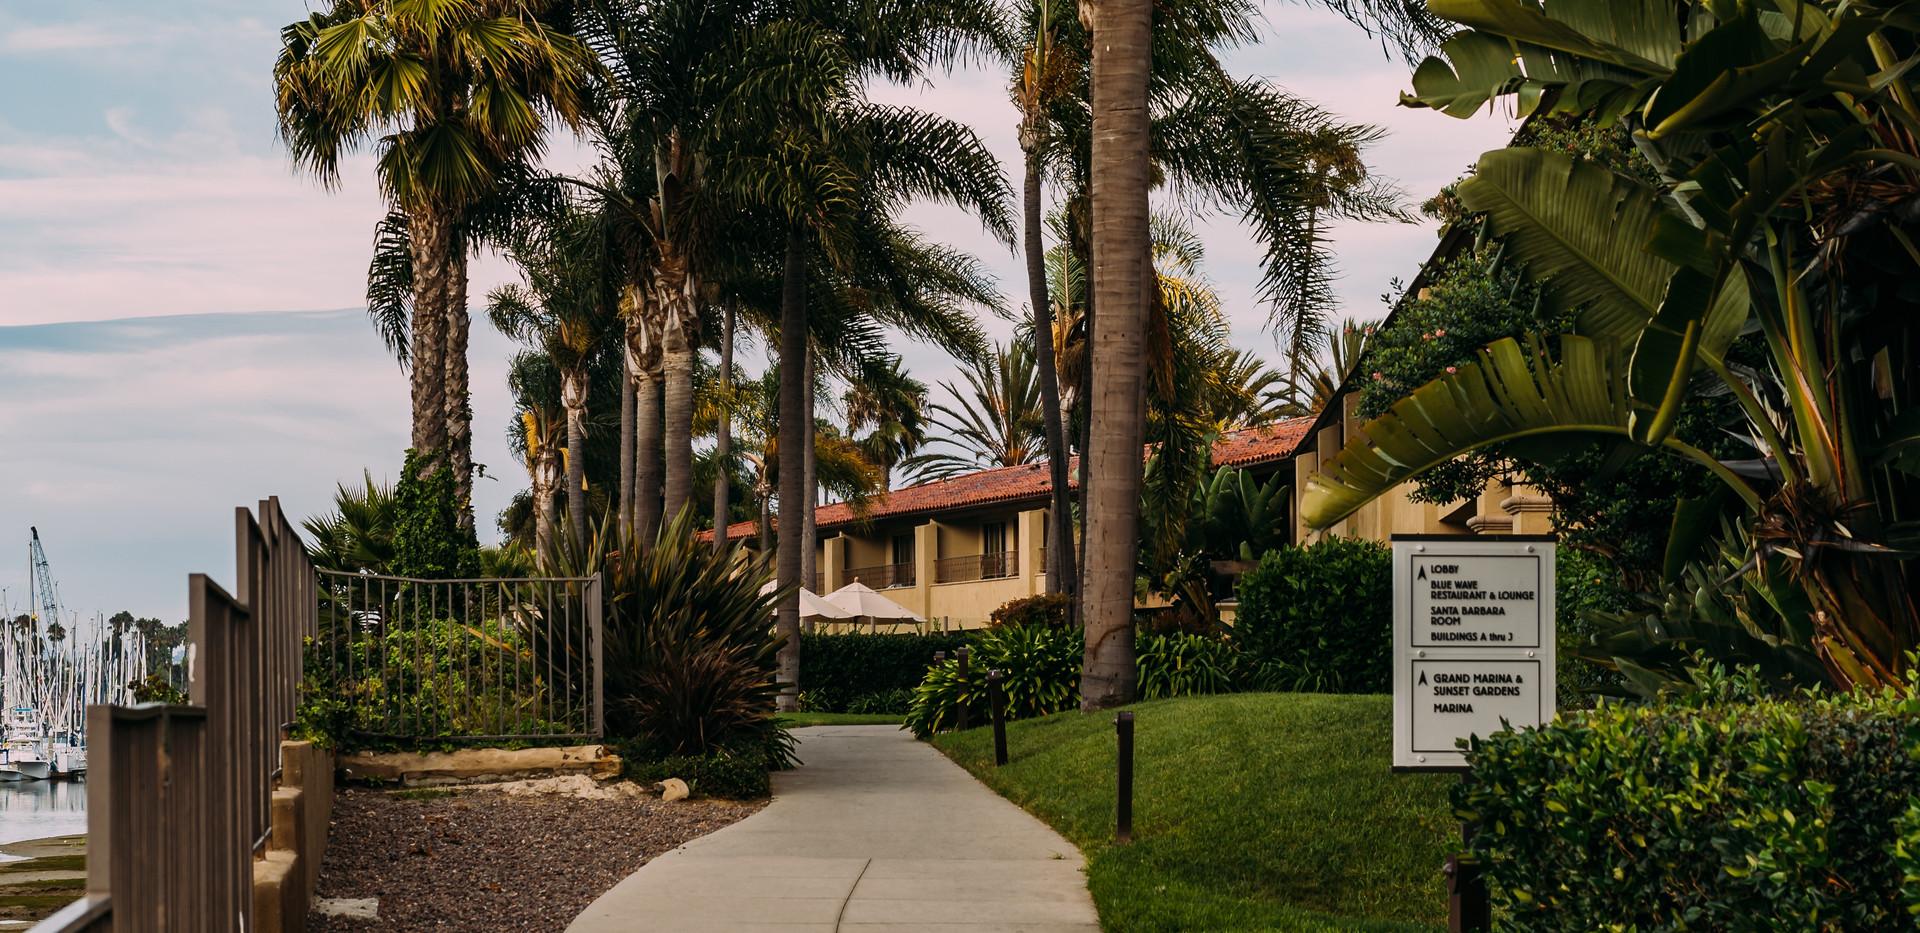 green-palm-trees-2946870.jpg